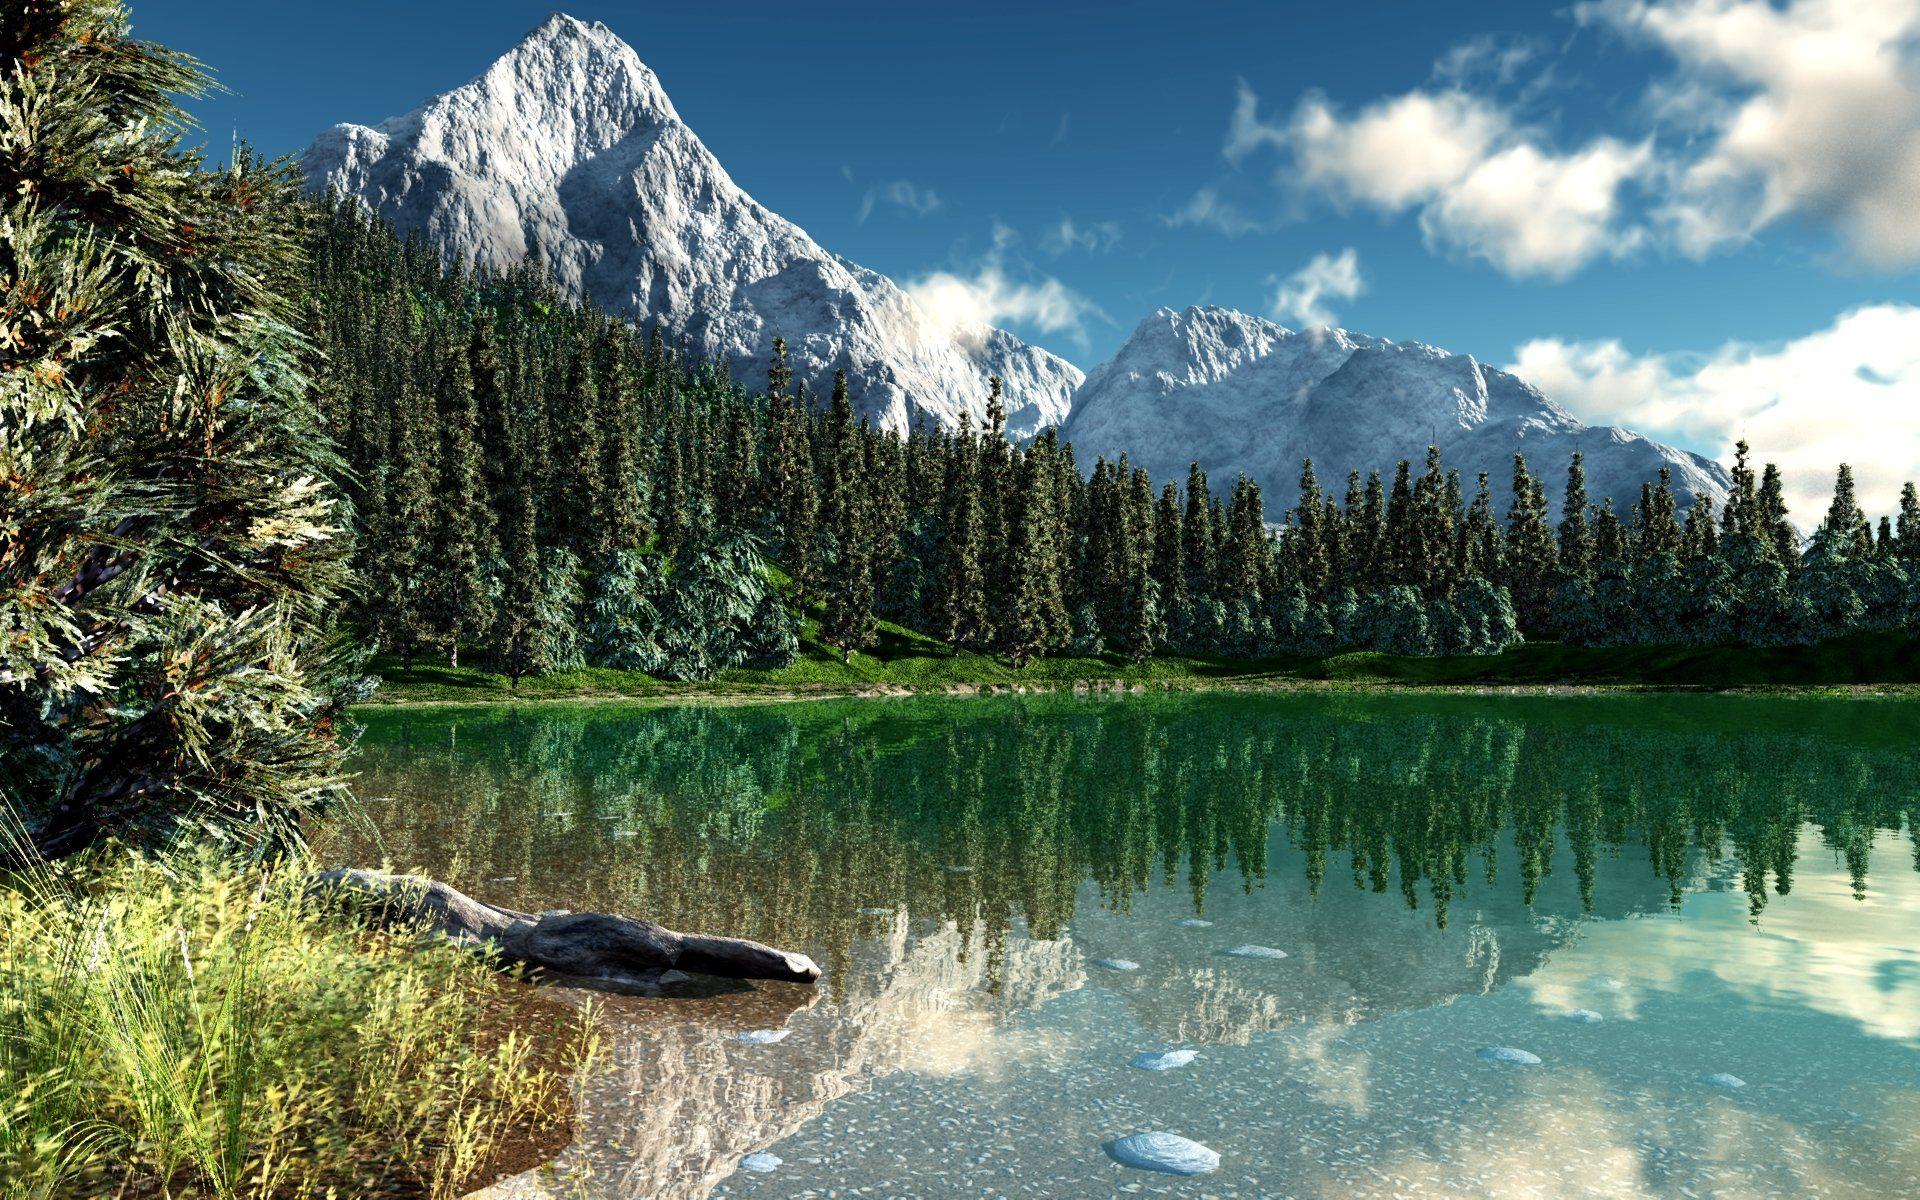 Landscape Wallpapers High Resolution | Nature | Pinterest ...